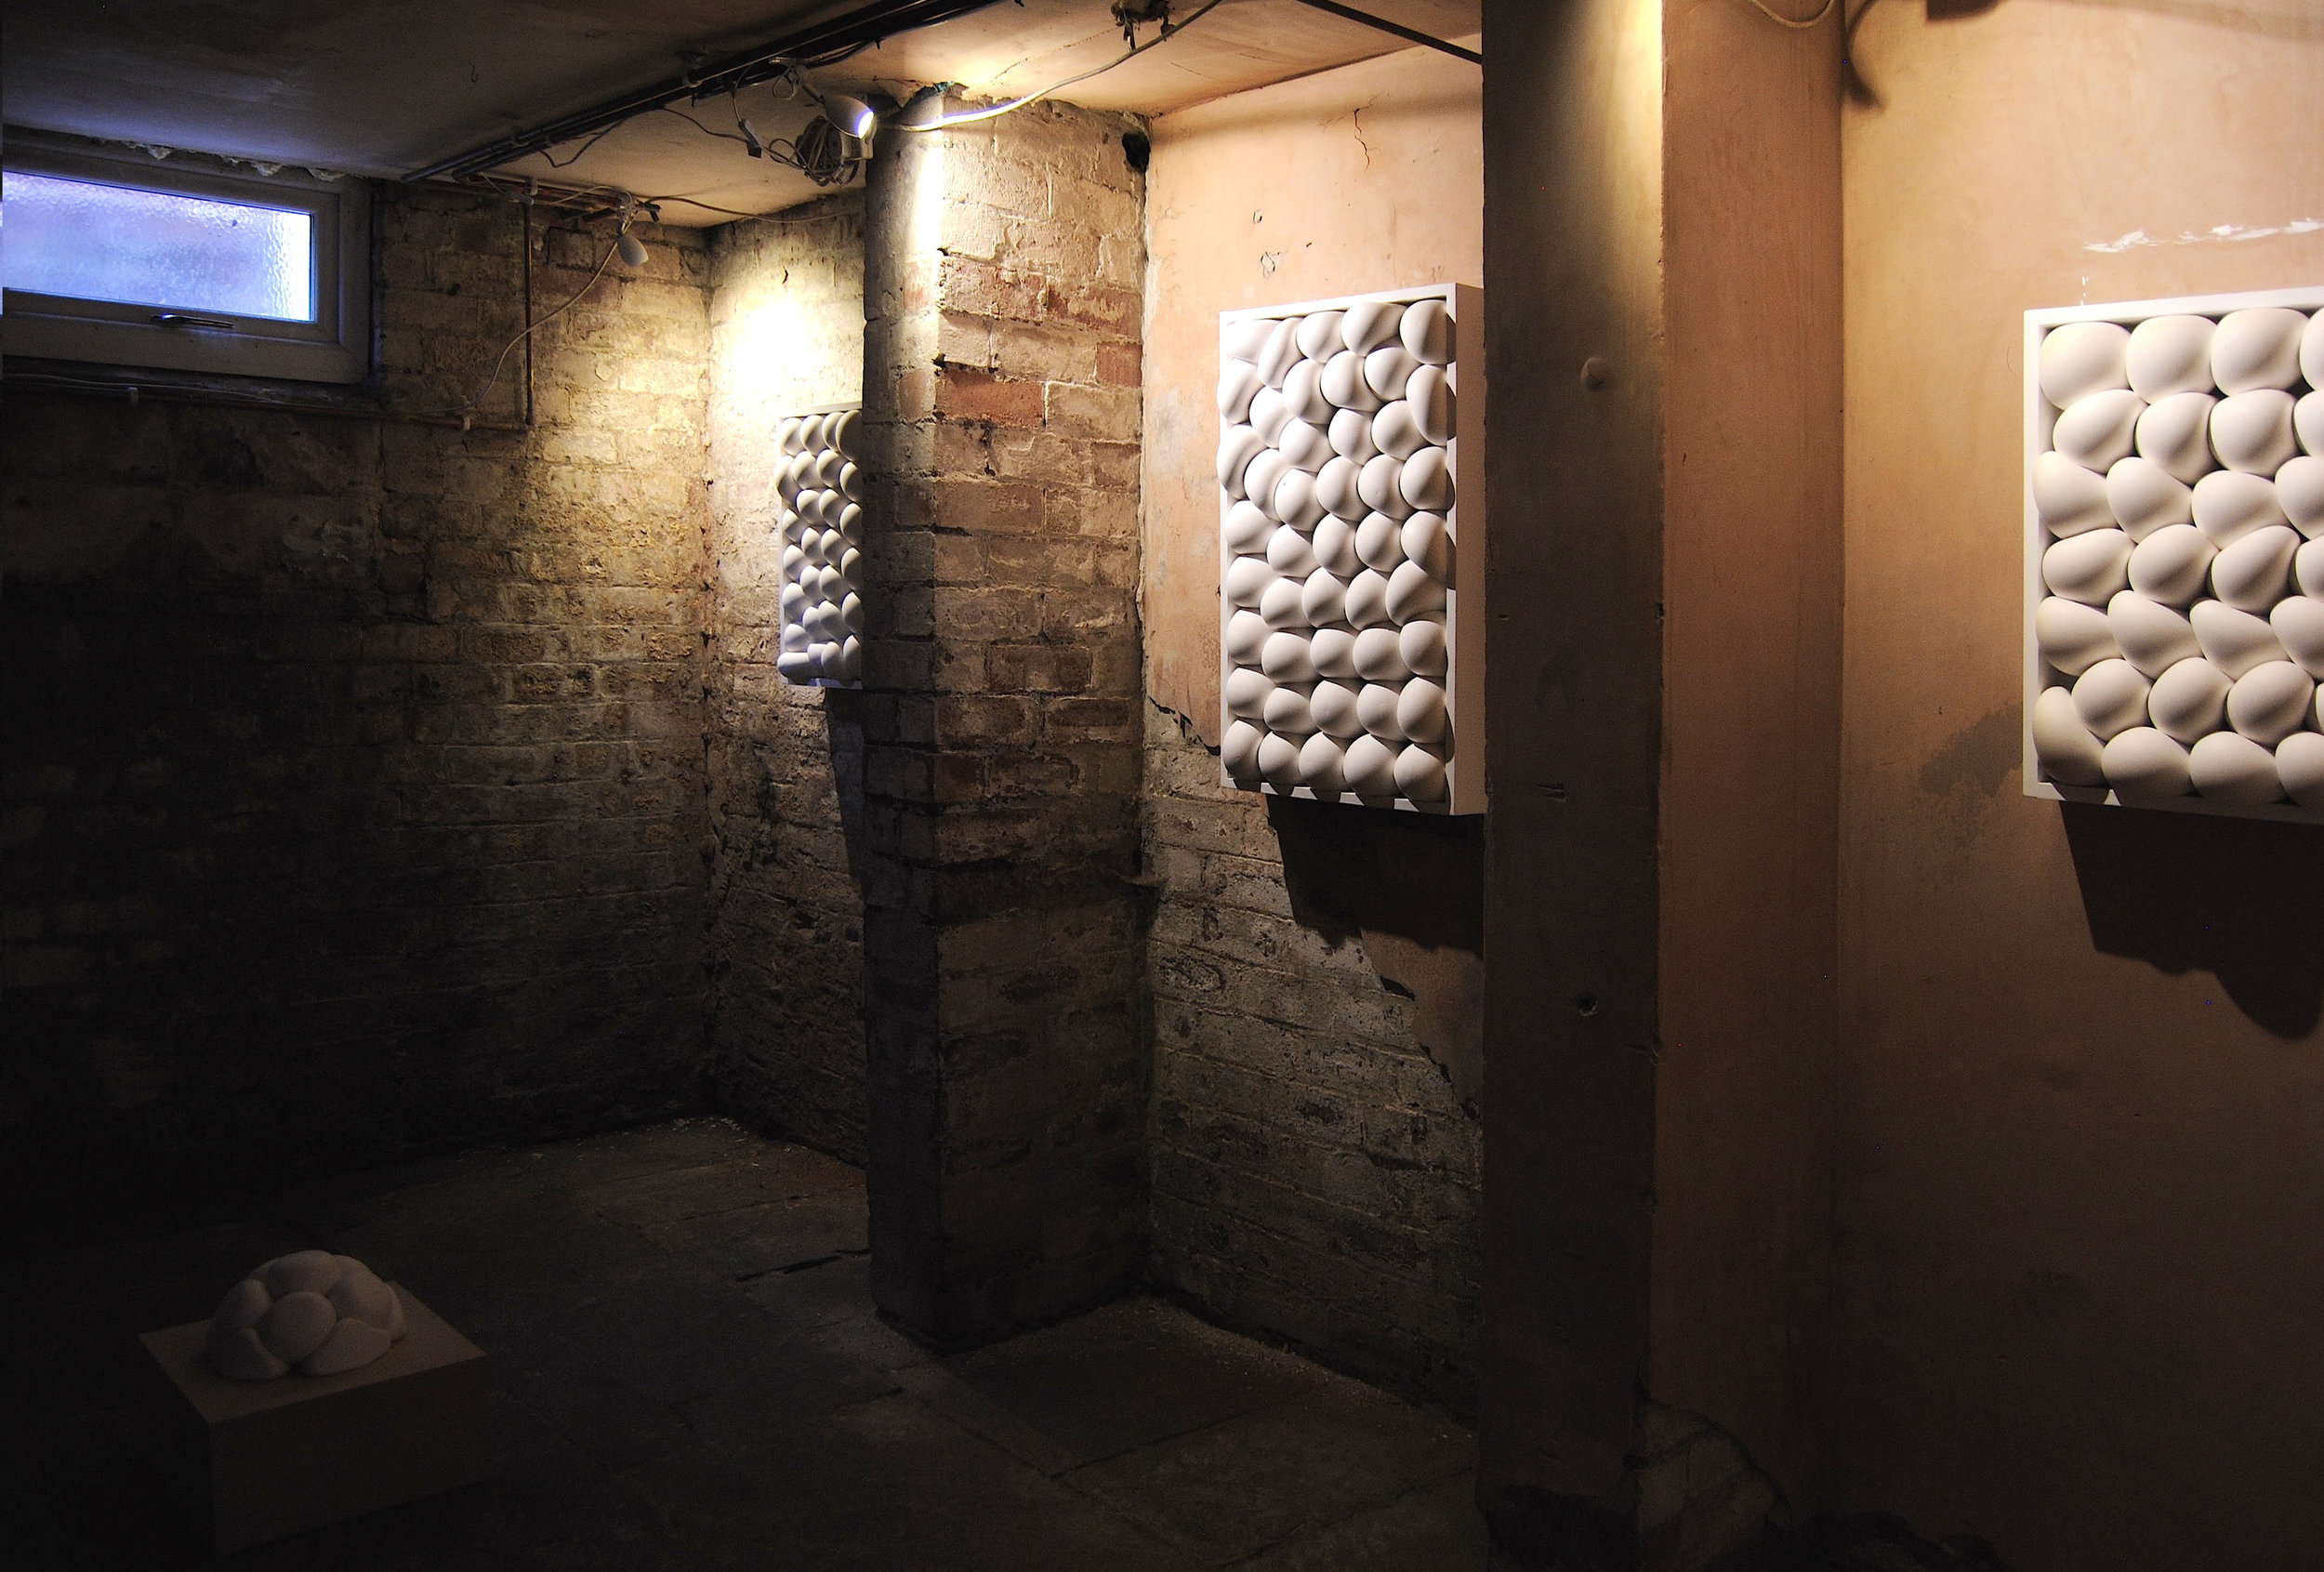 Room 1 Wall Pieces and 1 floor piece (1).jpg